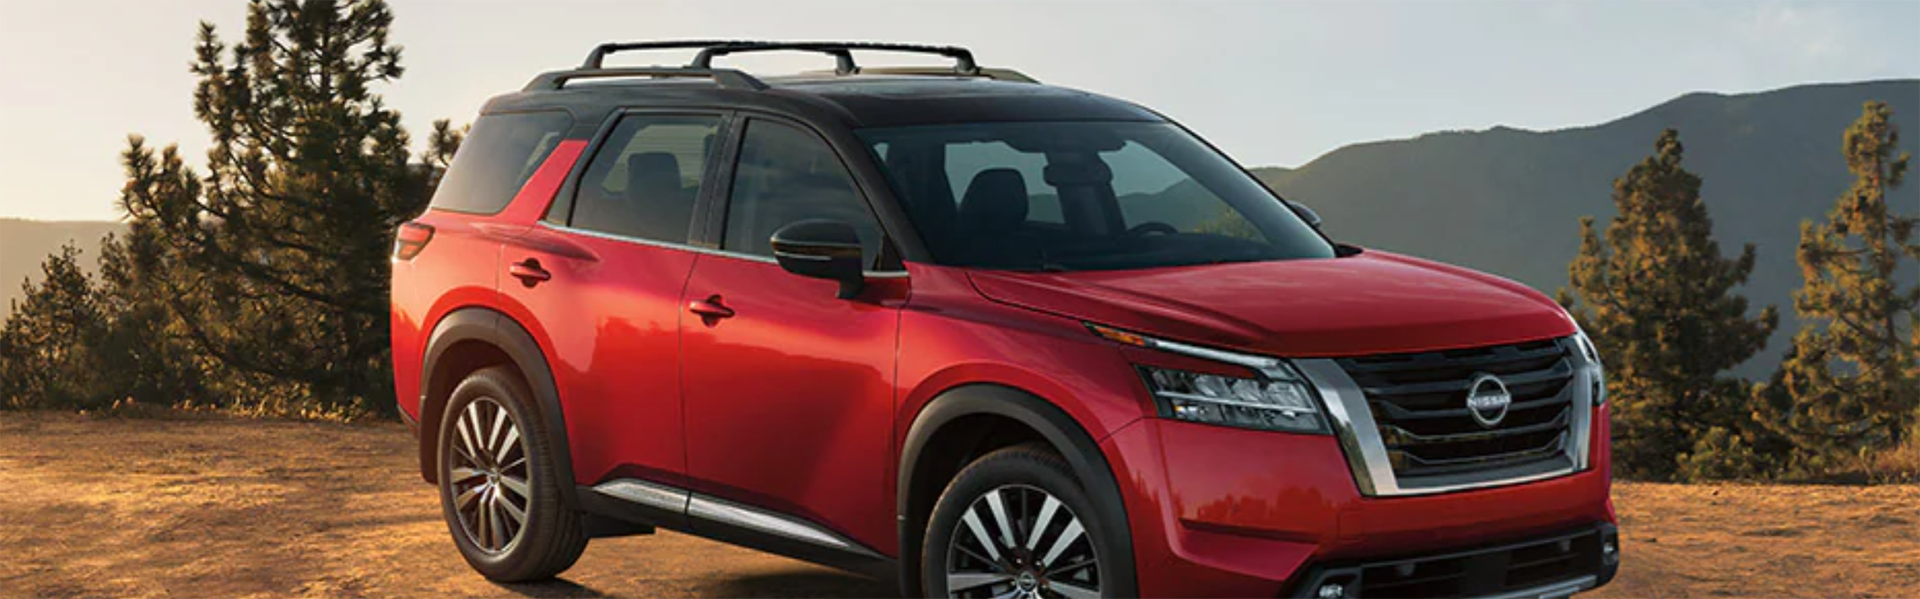 2022 Nissan Pathfinder Hero